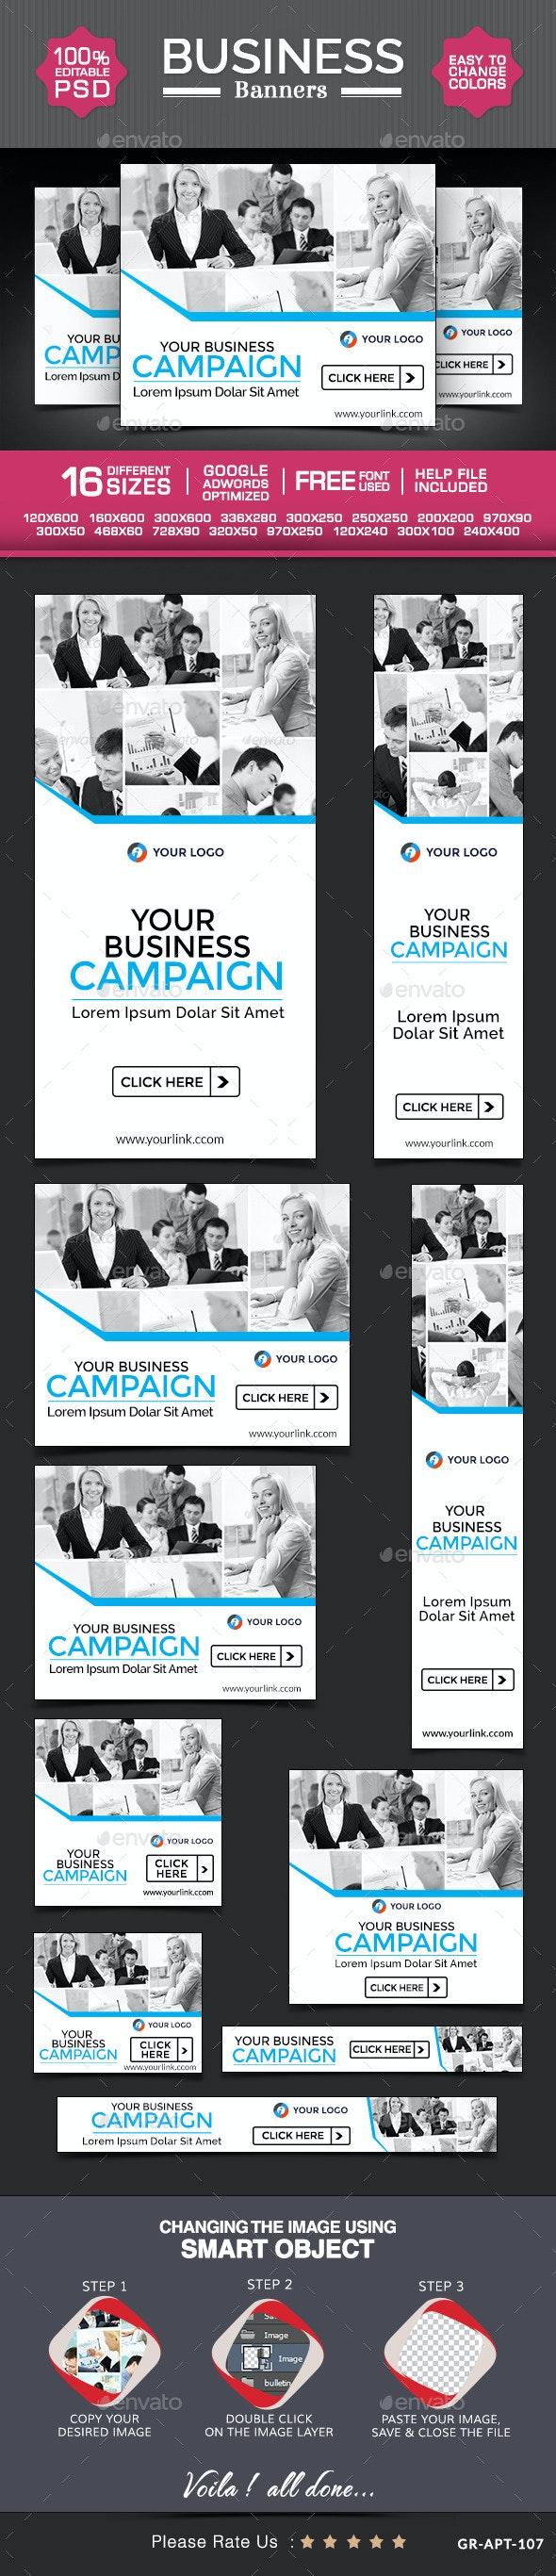 Business Web Banner Design Set - Banners & Ads Web Elements